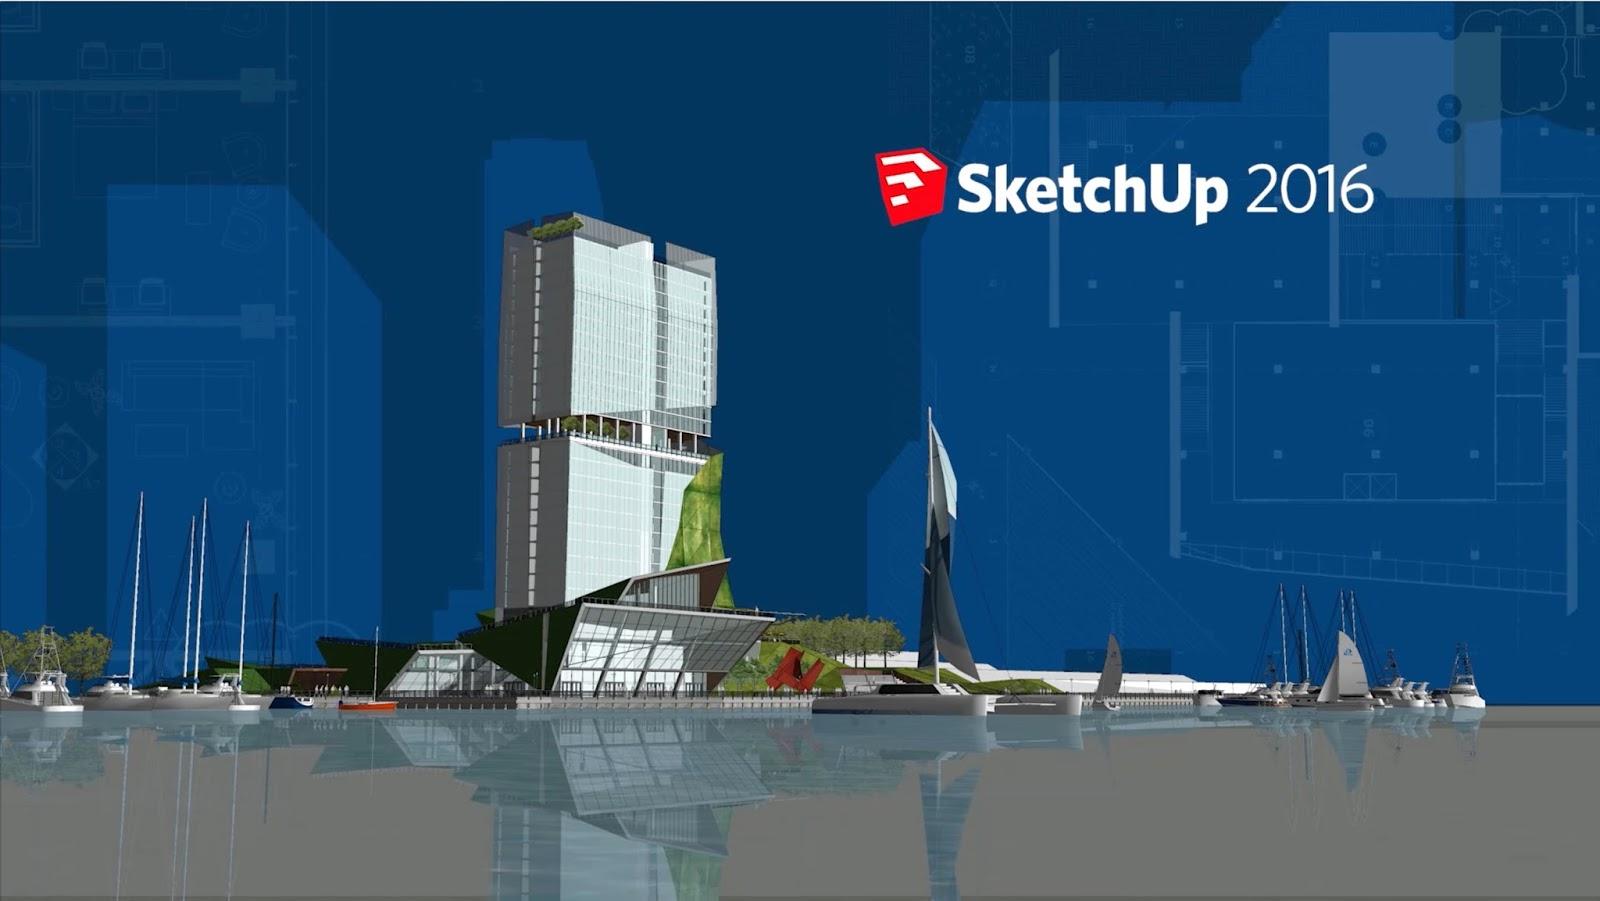 Sketchup_2016_jual